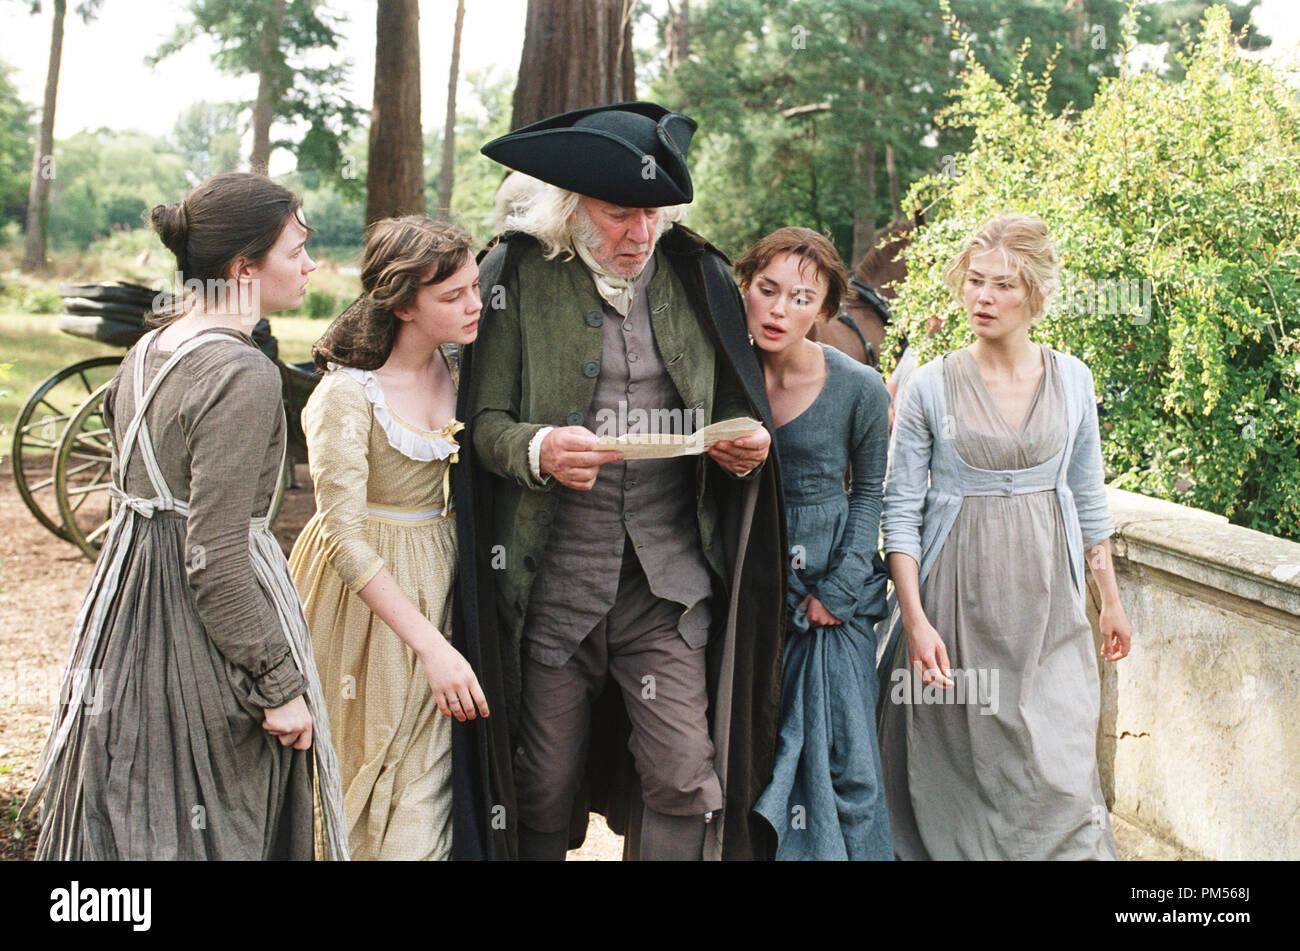 'Pride & Prejudice' Talulah Riley, Carey Mulligan, Donald Sutherland, Keira Knightley, Rosamund Pike - Stock Image